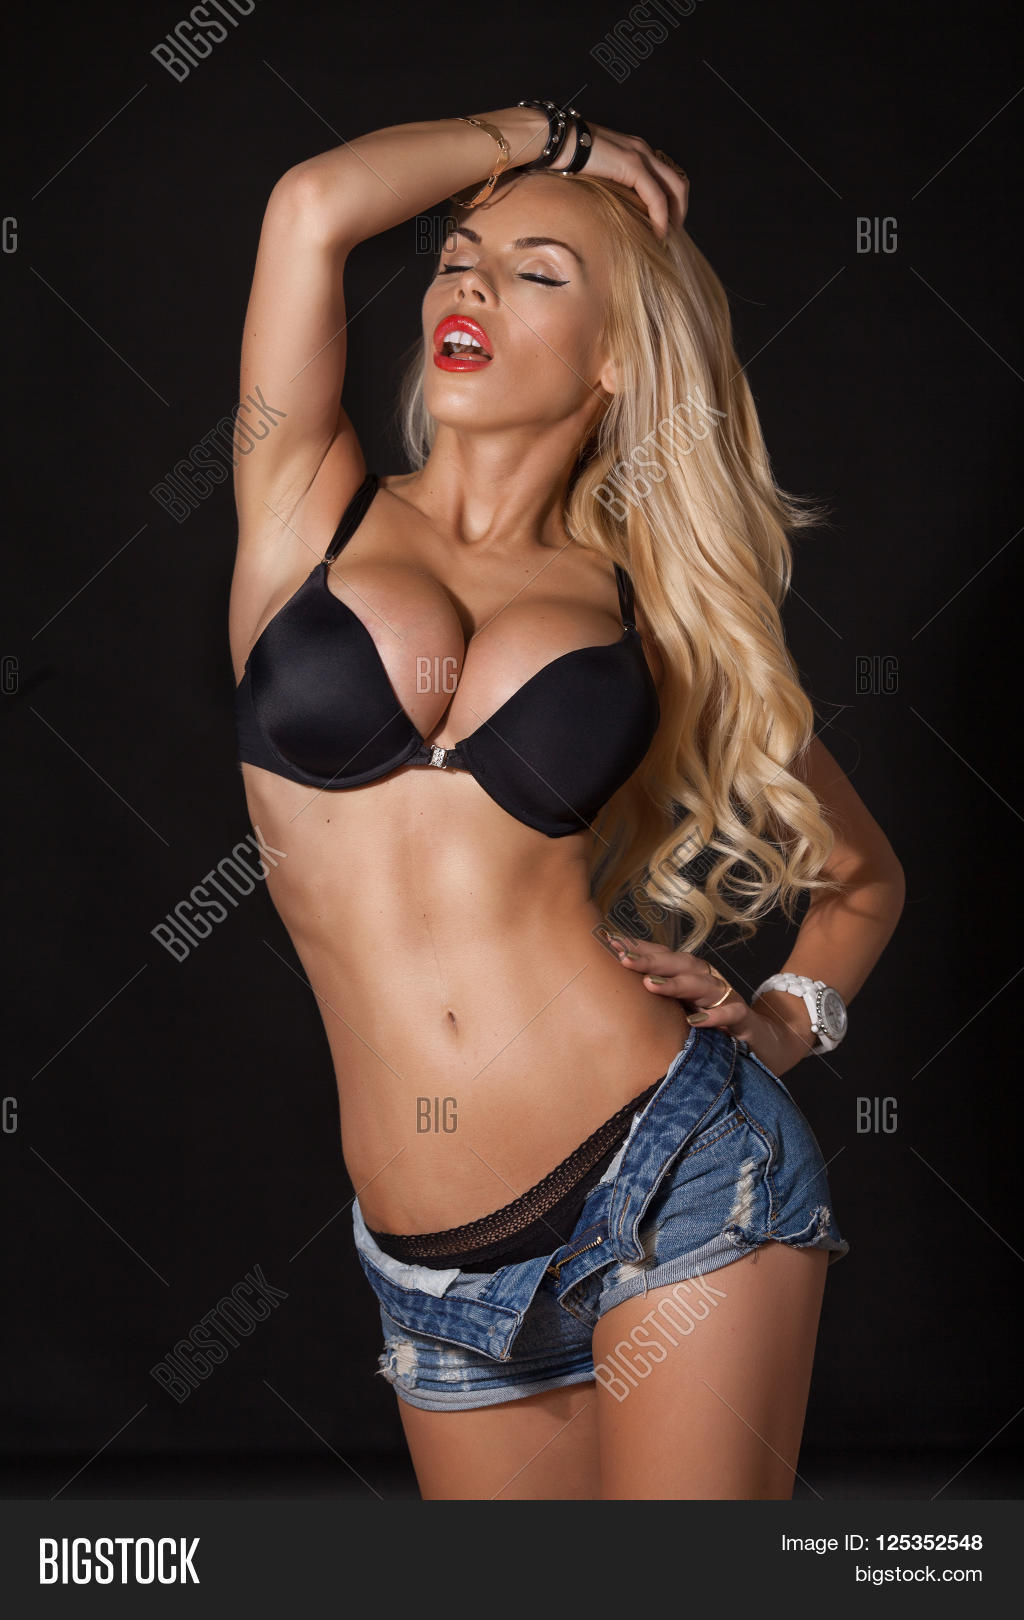 Woman boobs sexy 24 Girls